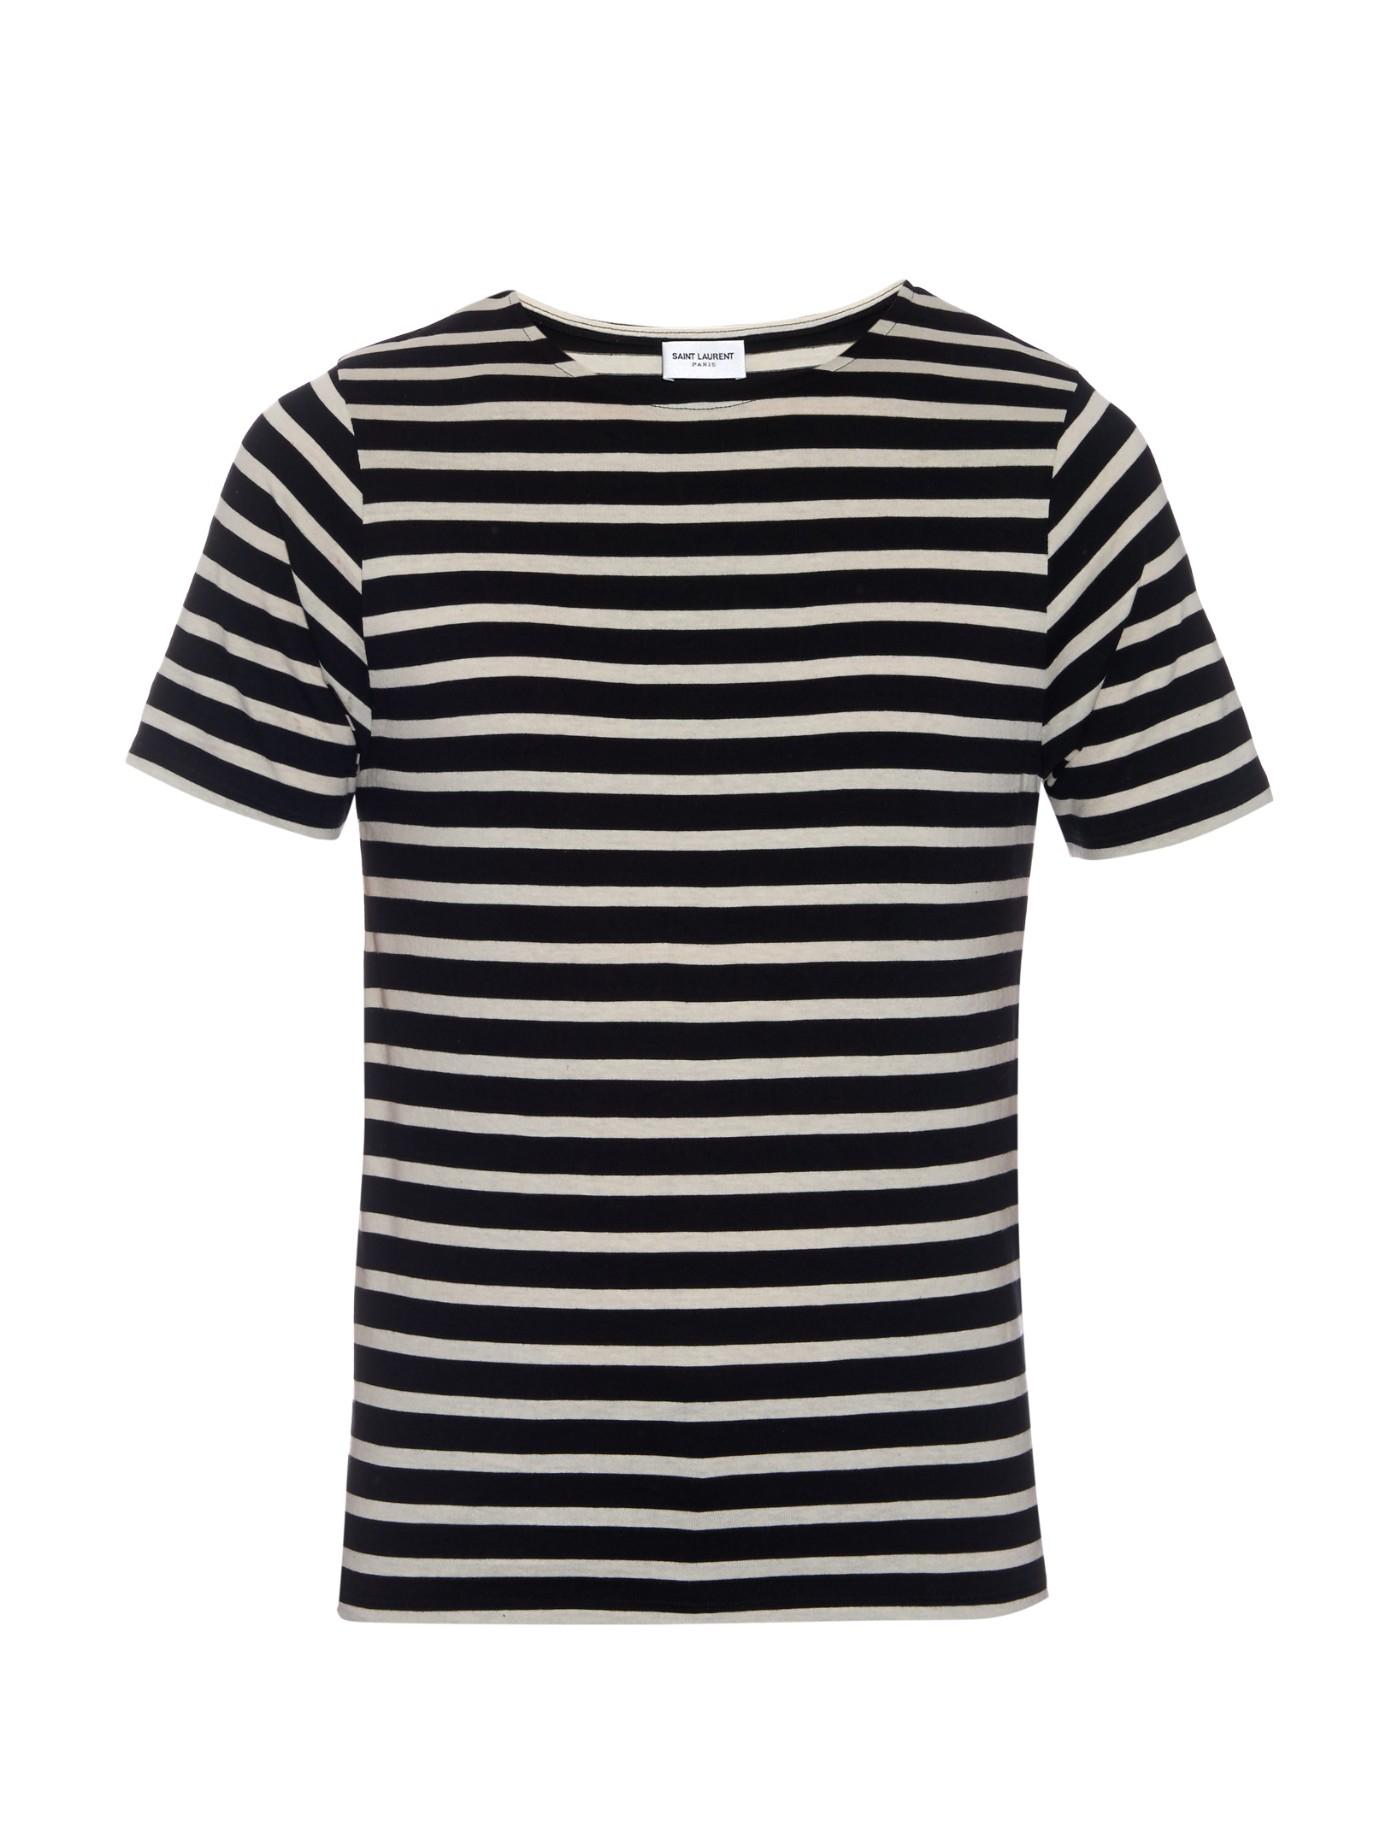 Saint laurent striped cotton jersey t shirt in black for for Saint laurent t shirt